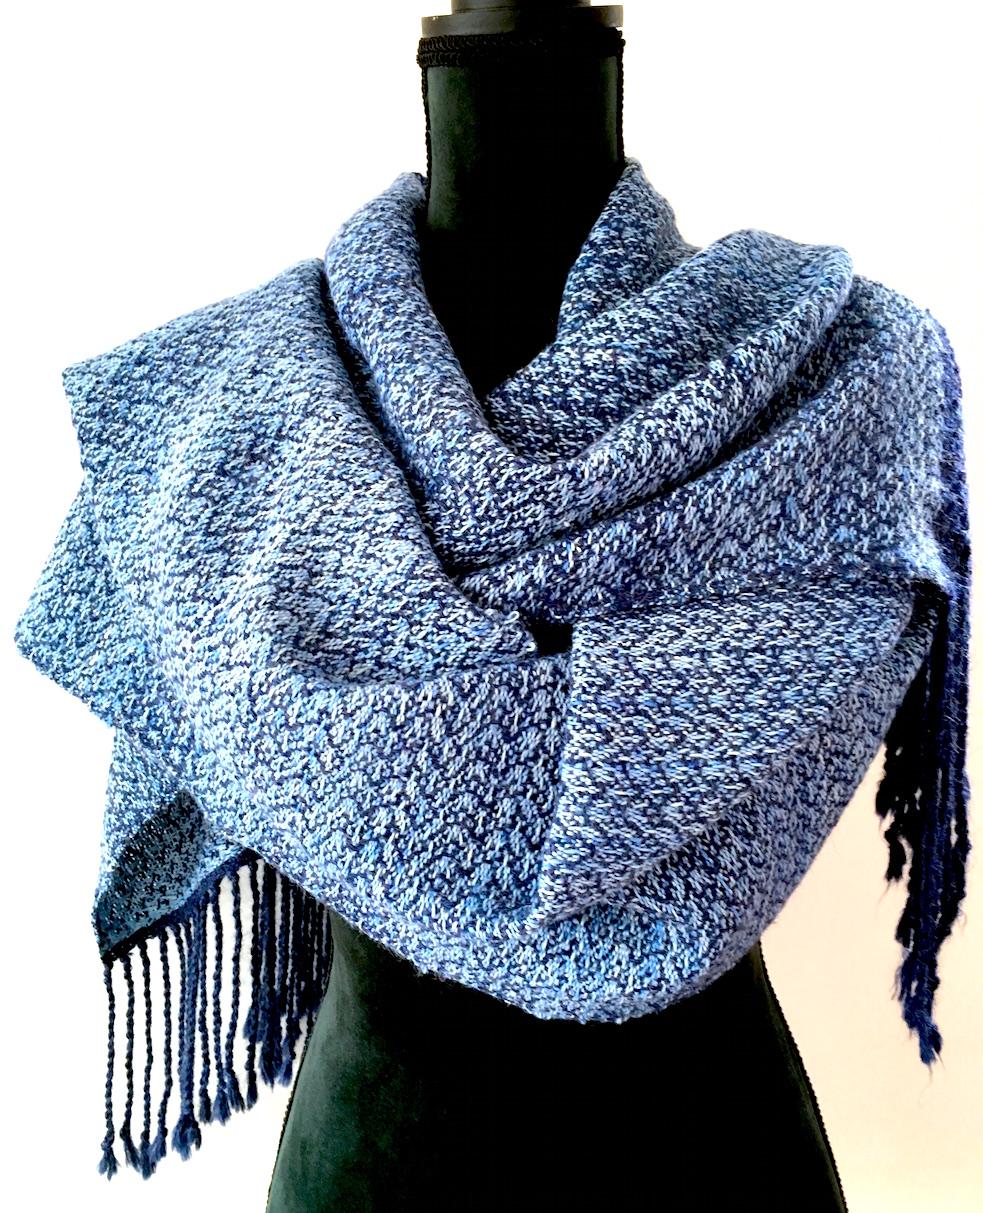 Blauw alpaca shawl